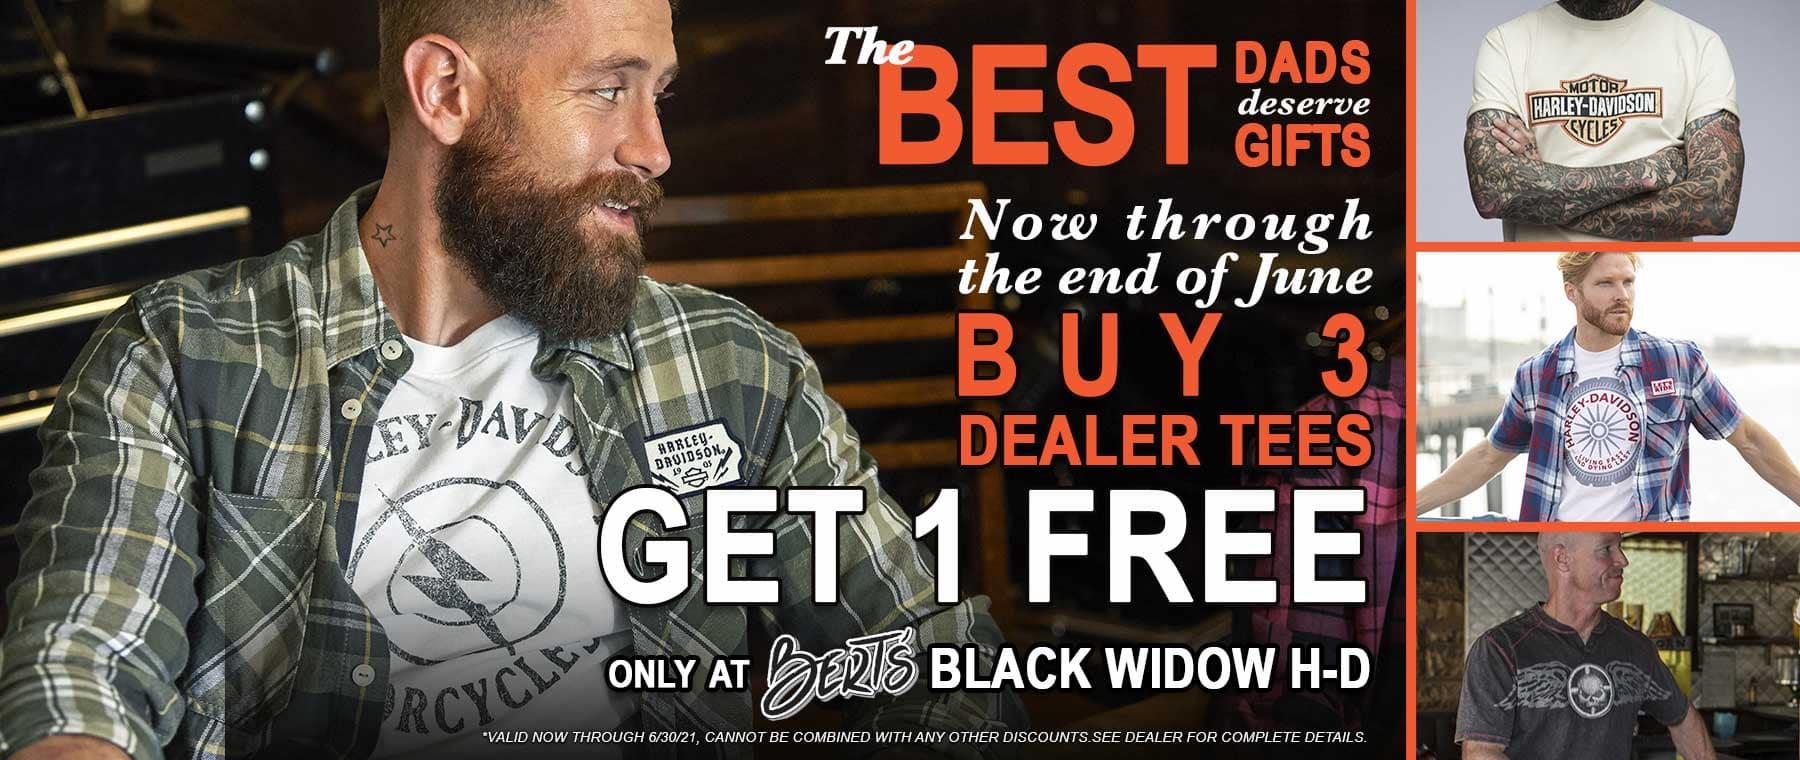 BERTS-HD_052921_Buy3Get1FreeTee_FathersDay_web